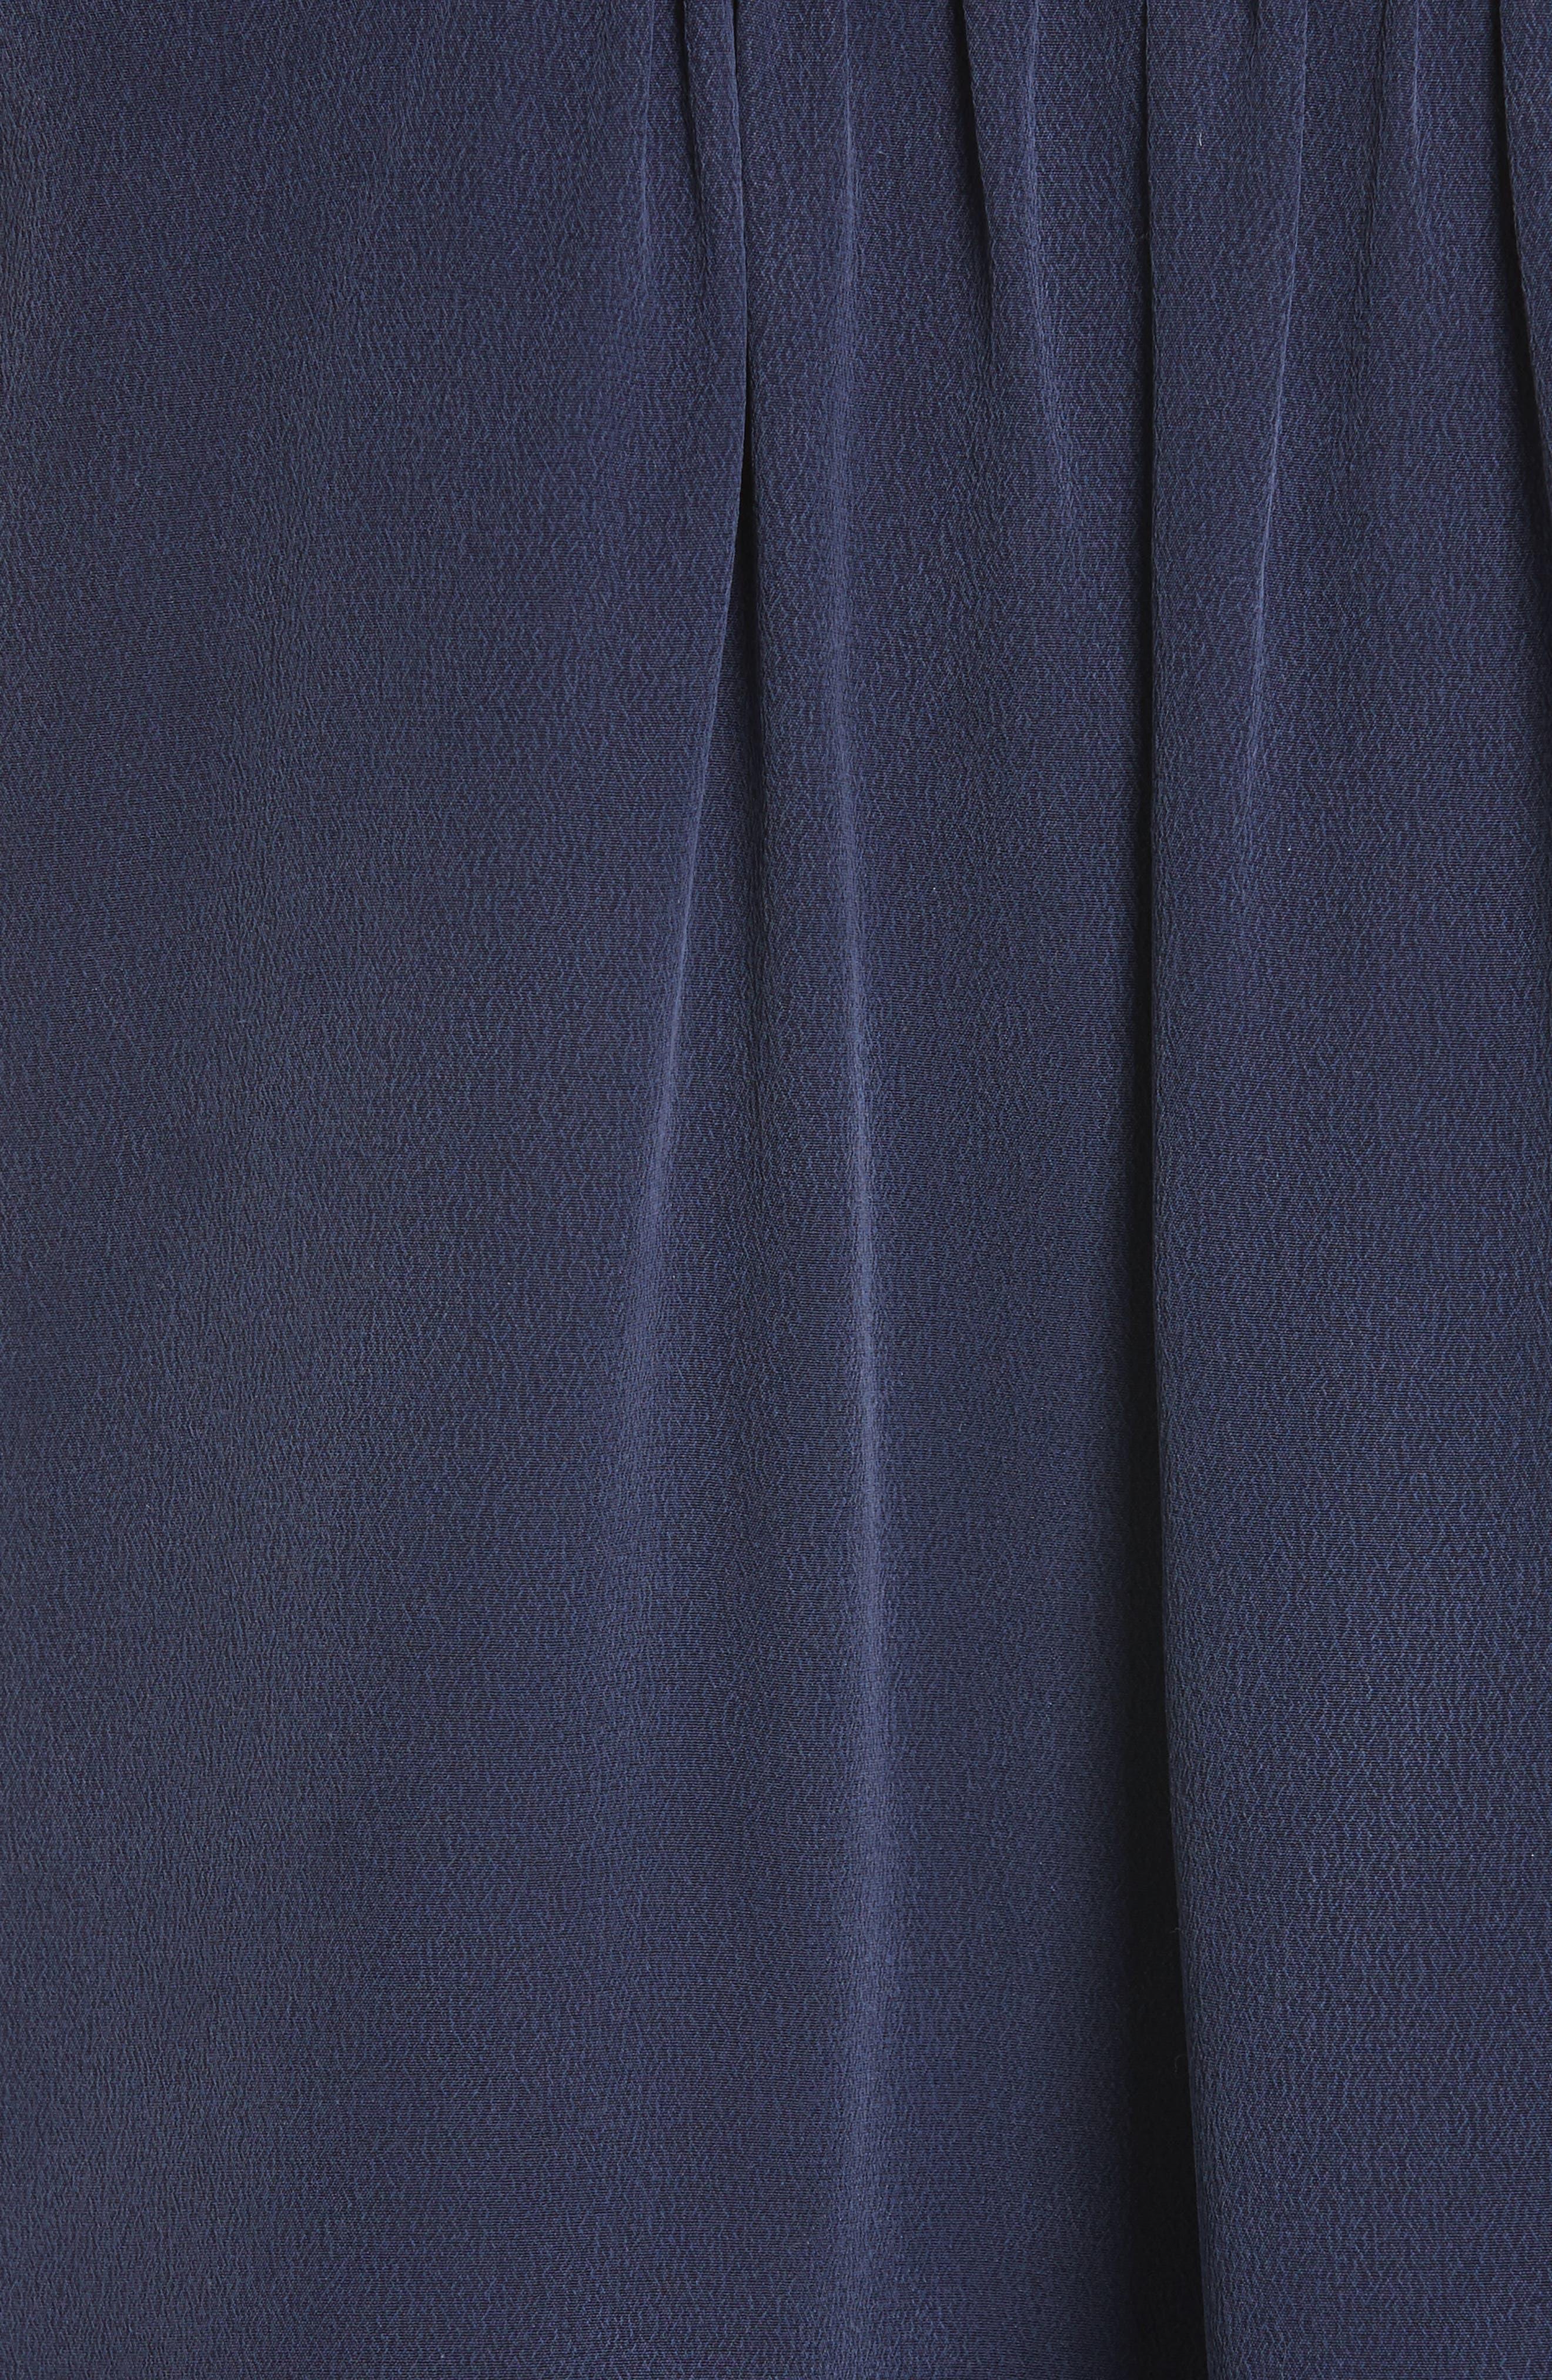 Alvery Lace Trim Silk Shell,                             Alternate thumbnail 5, color,                             411